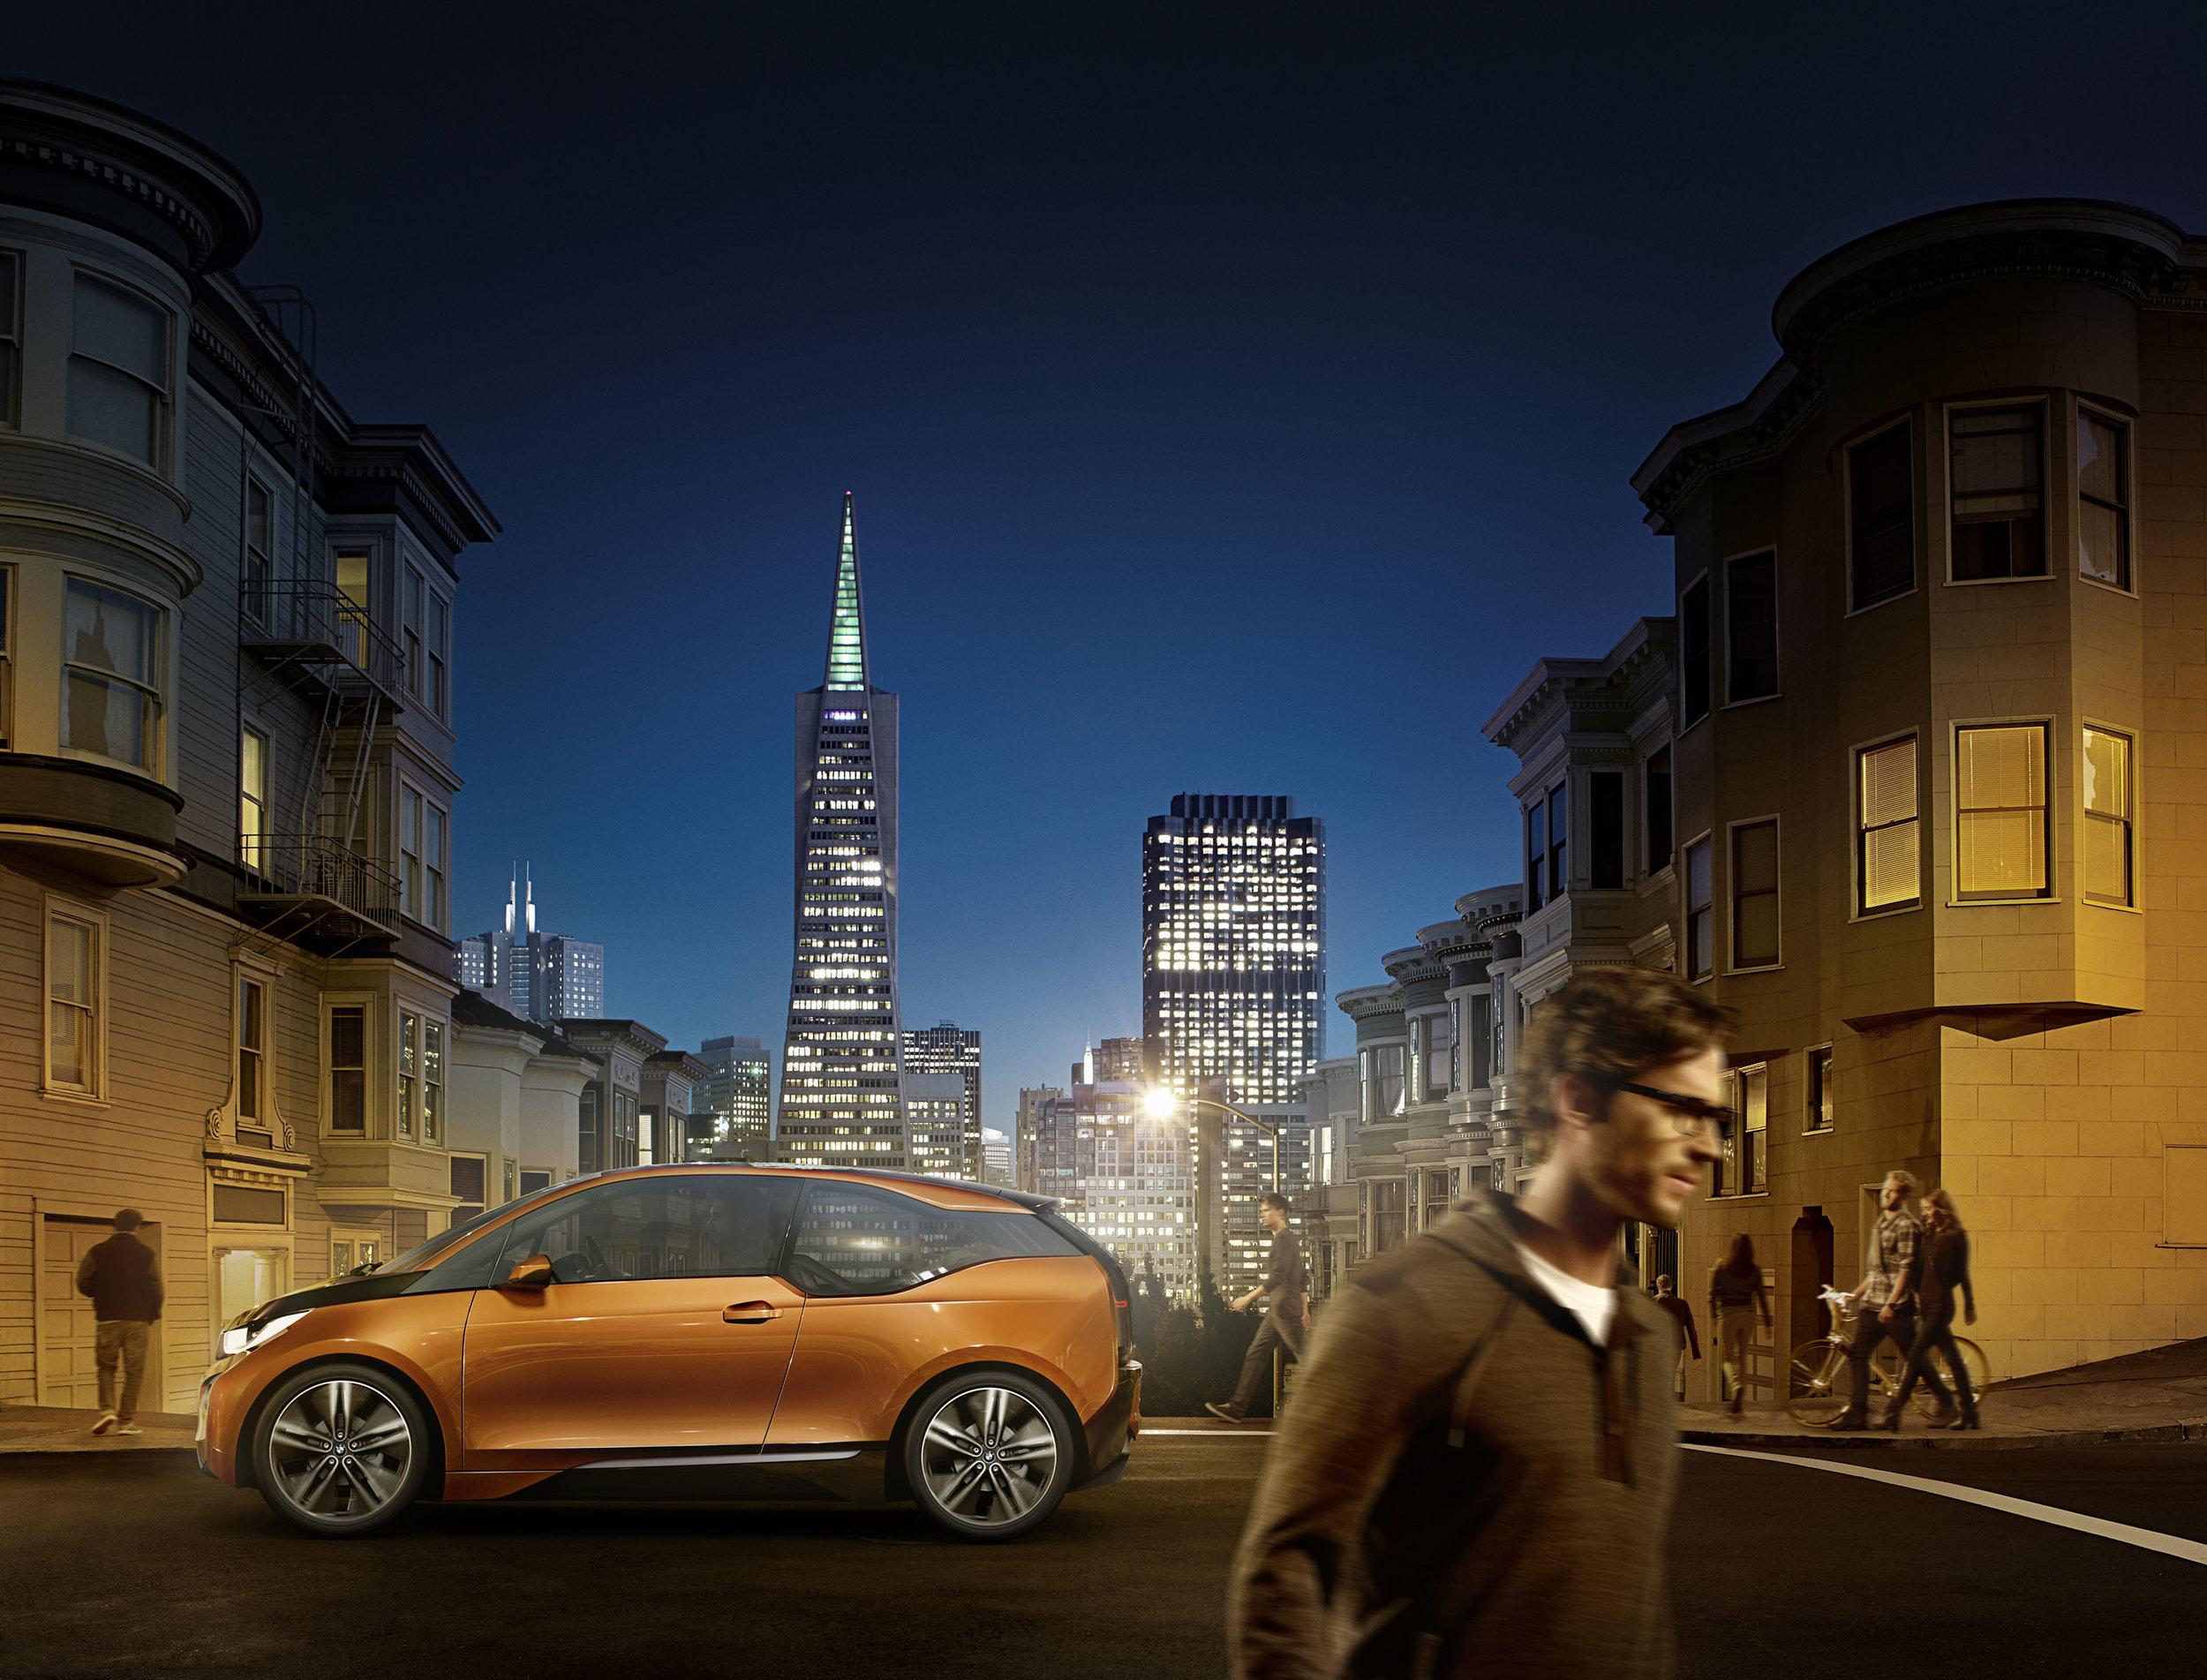 BMW_Motiv02_RGB.jpg